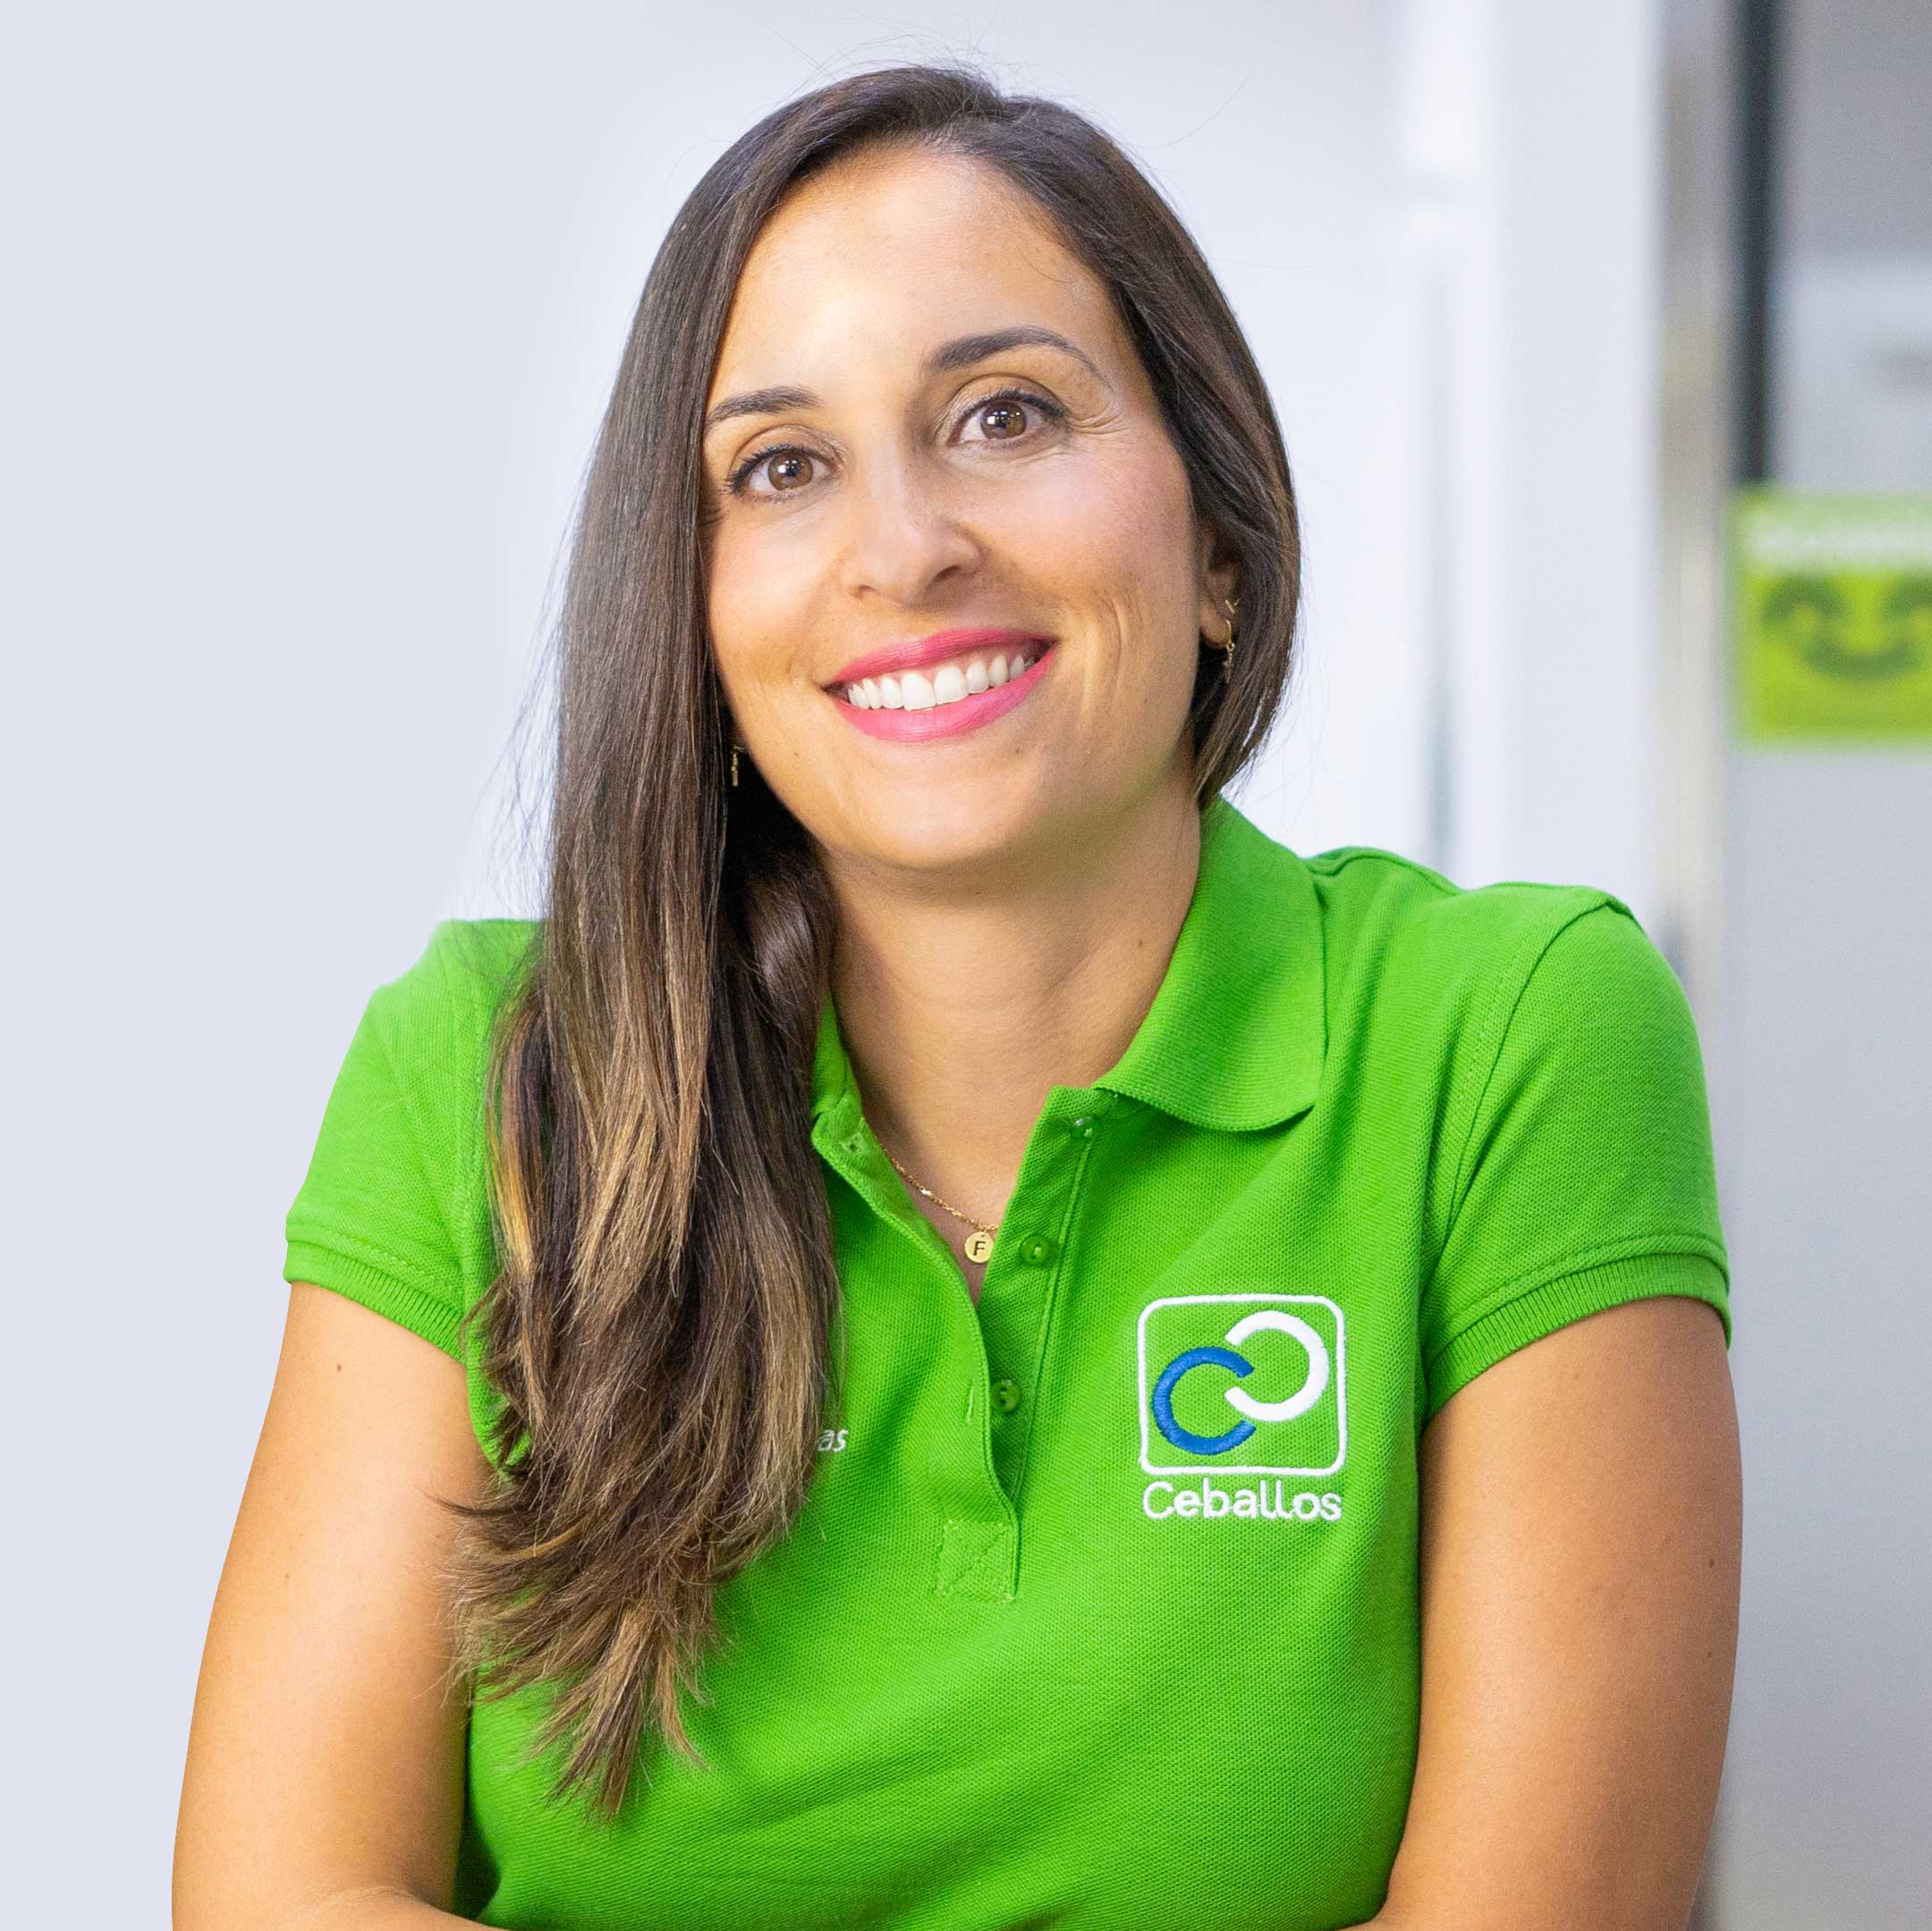 Dra Elena Ceballos